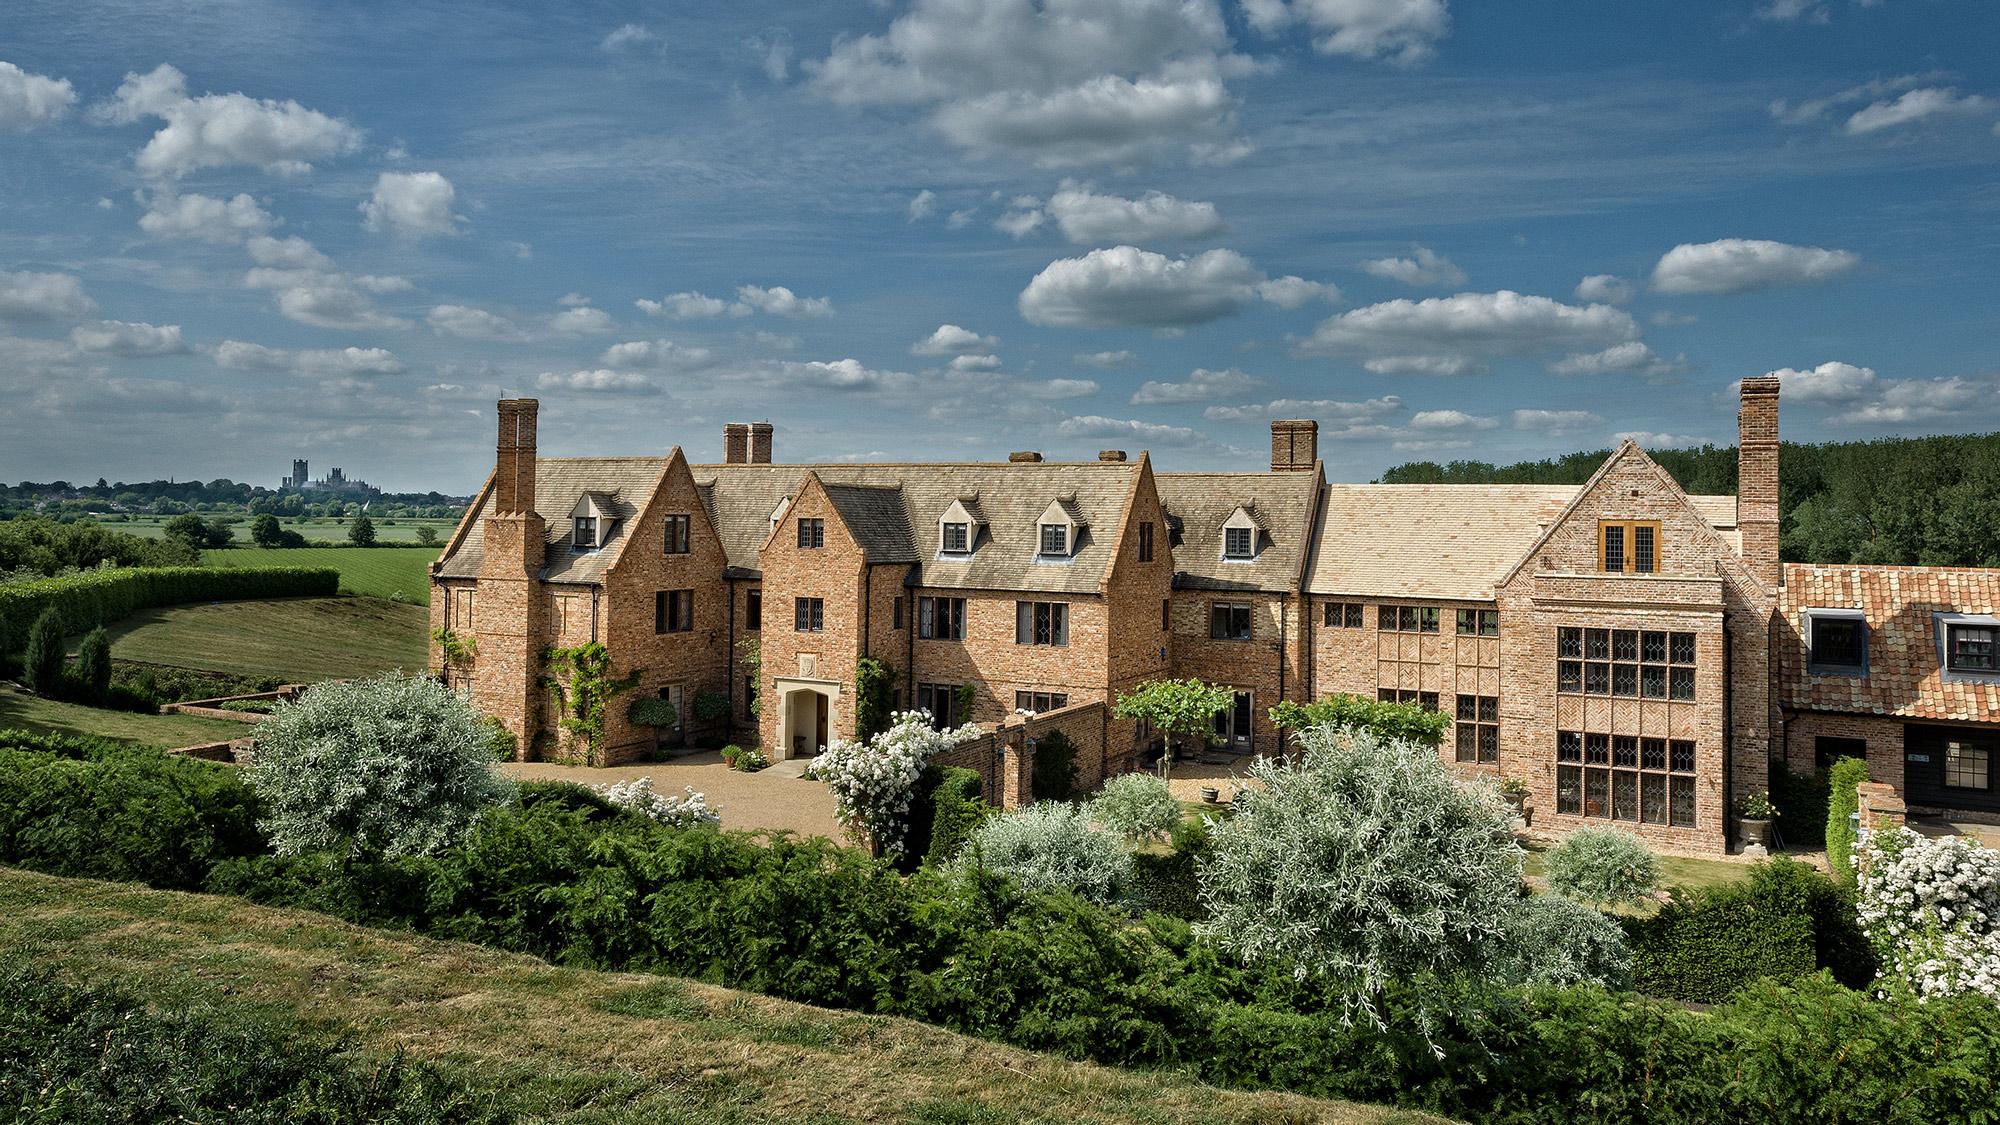 The Old Hall Ely, Cambridgeshire, Wedding Venue